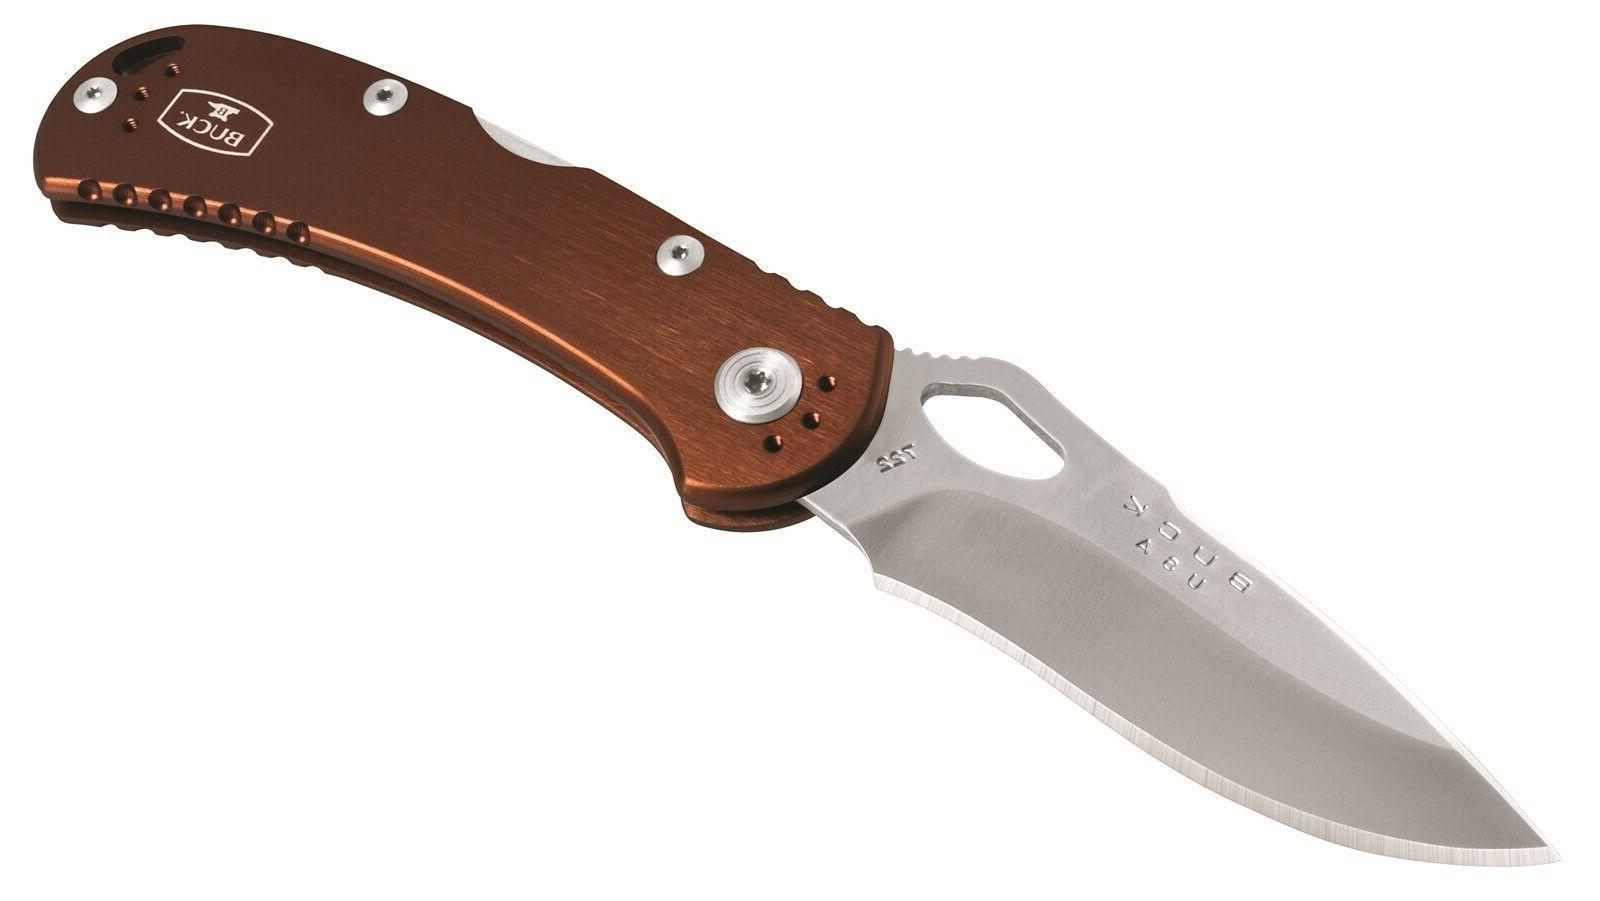 knives 722 spitfire brown locking folding knife